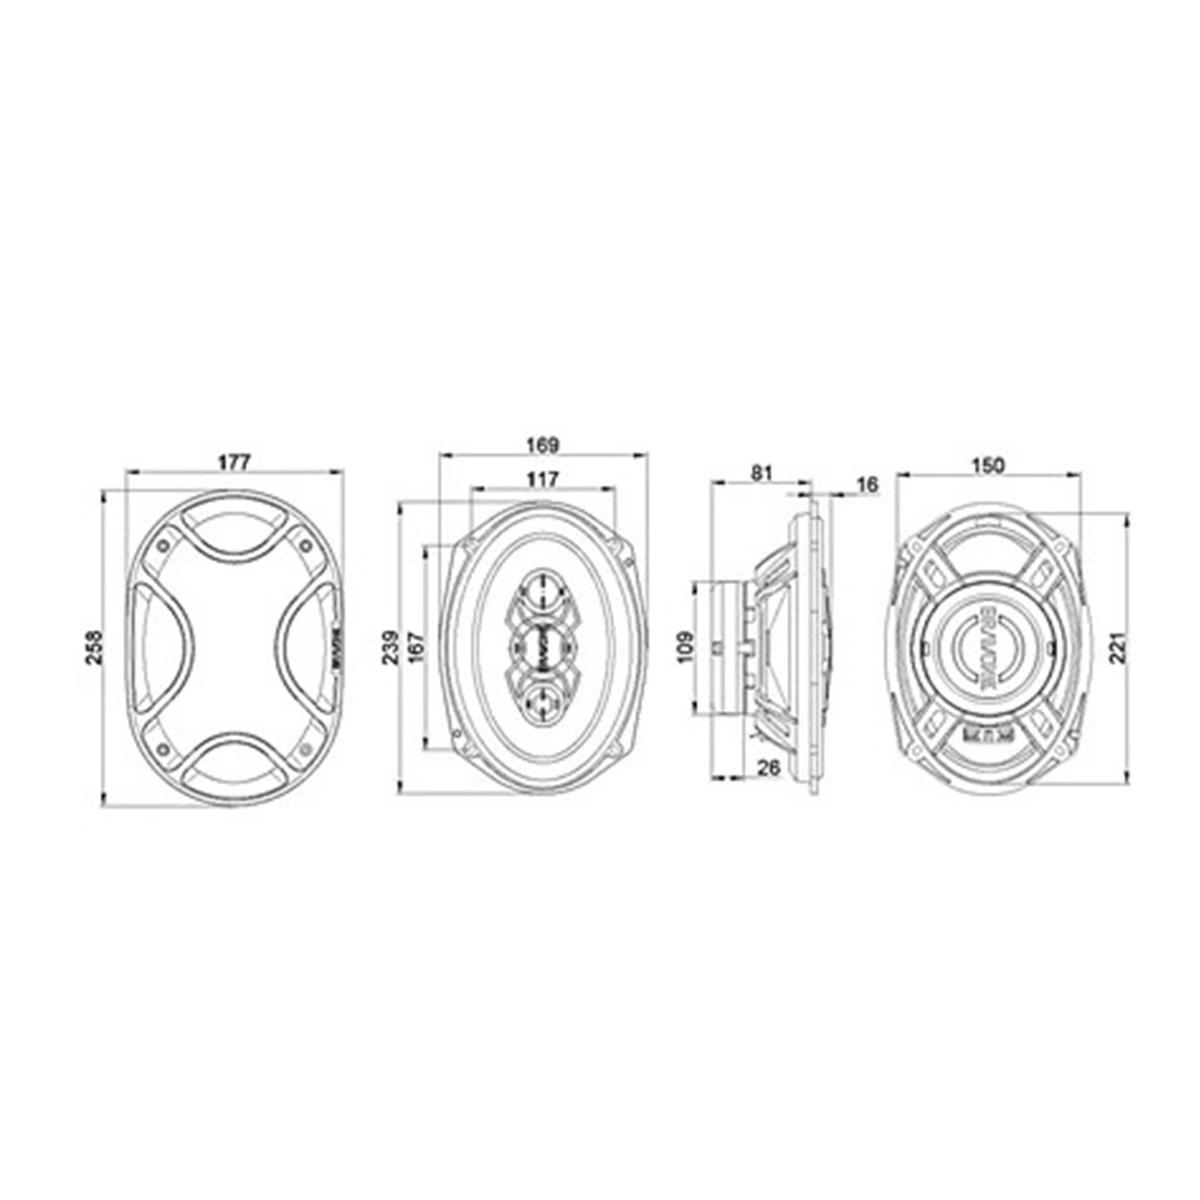 "Alto Falante Kit Fácil Bravox Triaxial 6""e 6x9"" Quadriaxial 240 WRMS"